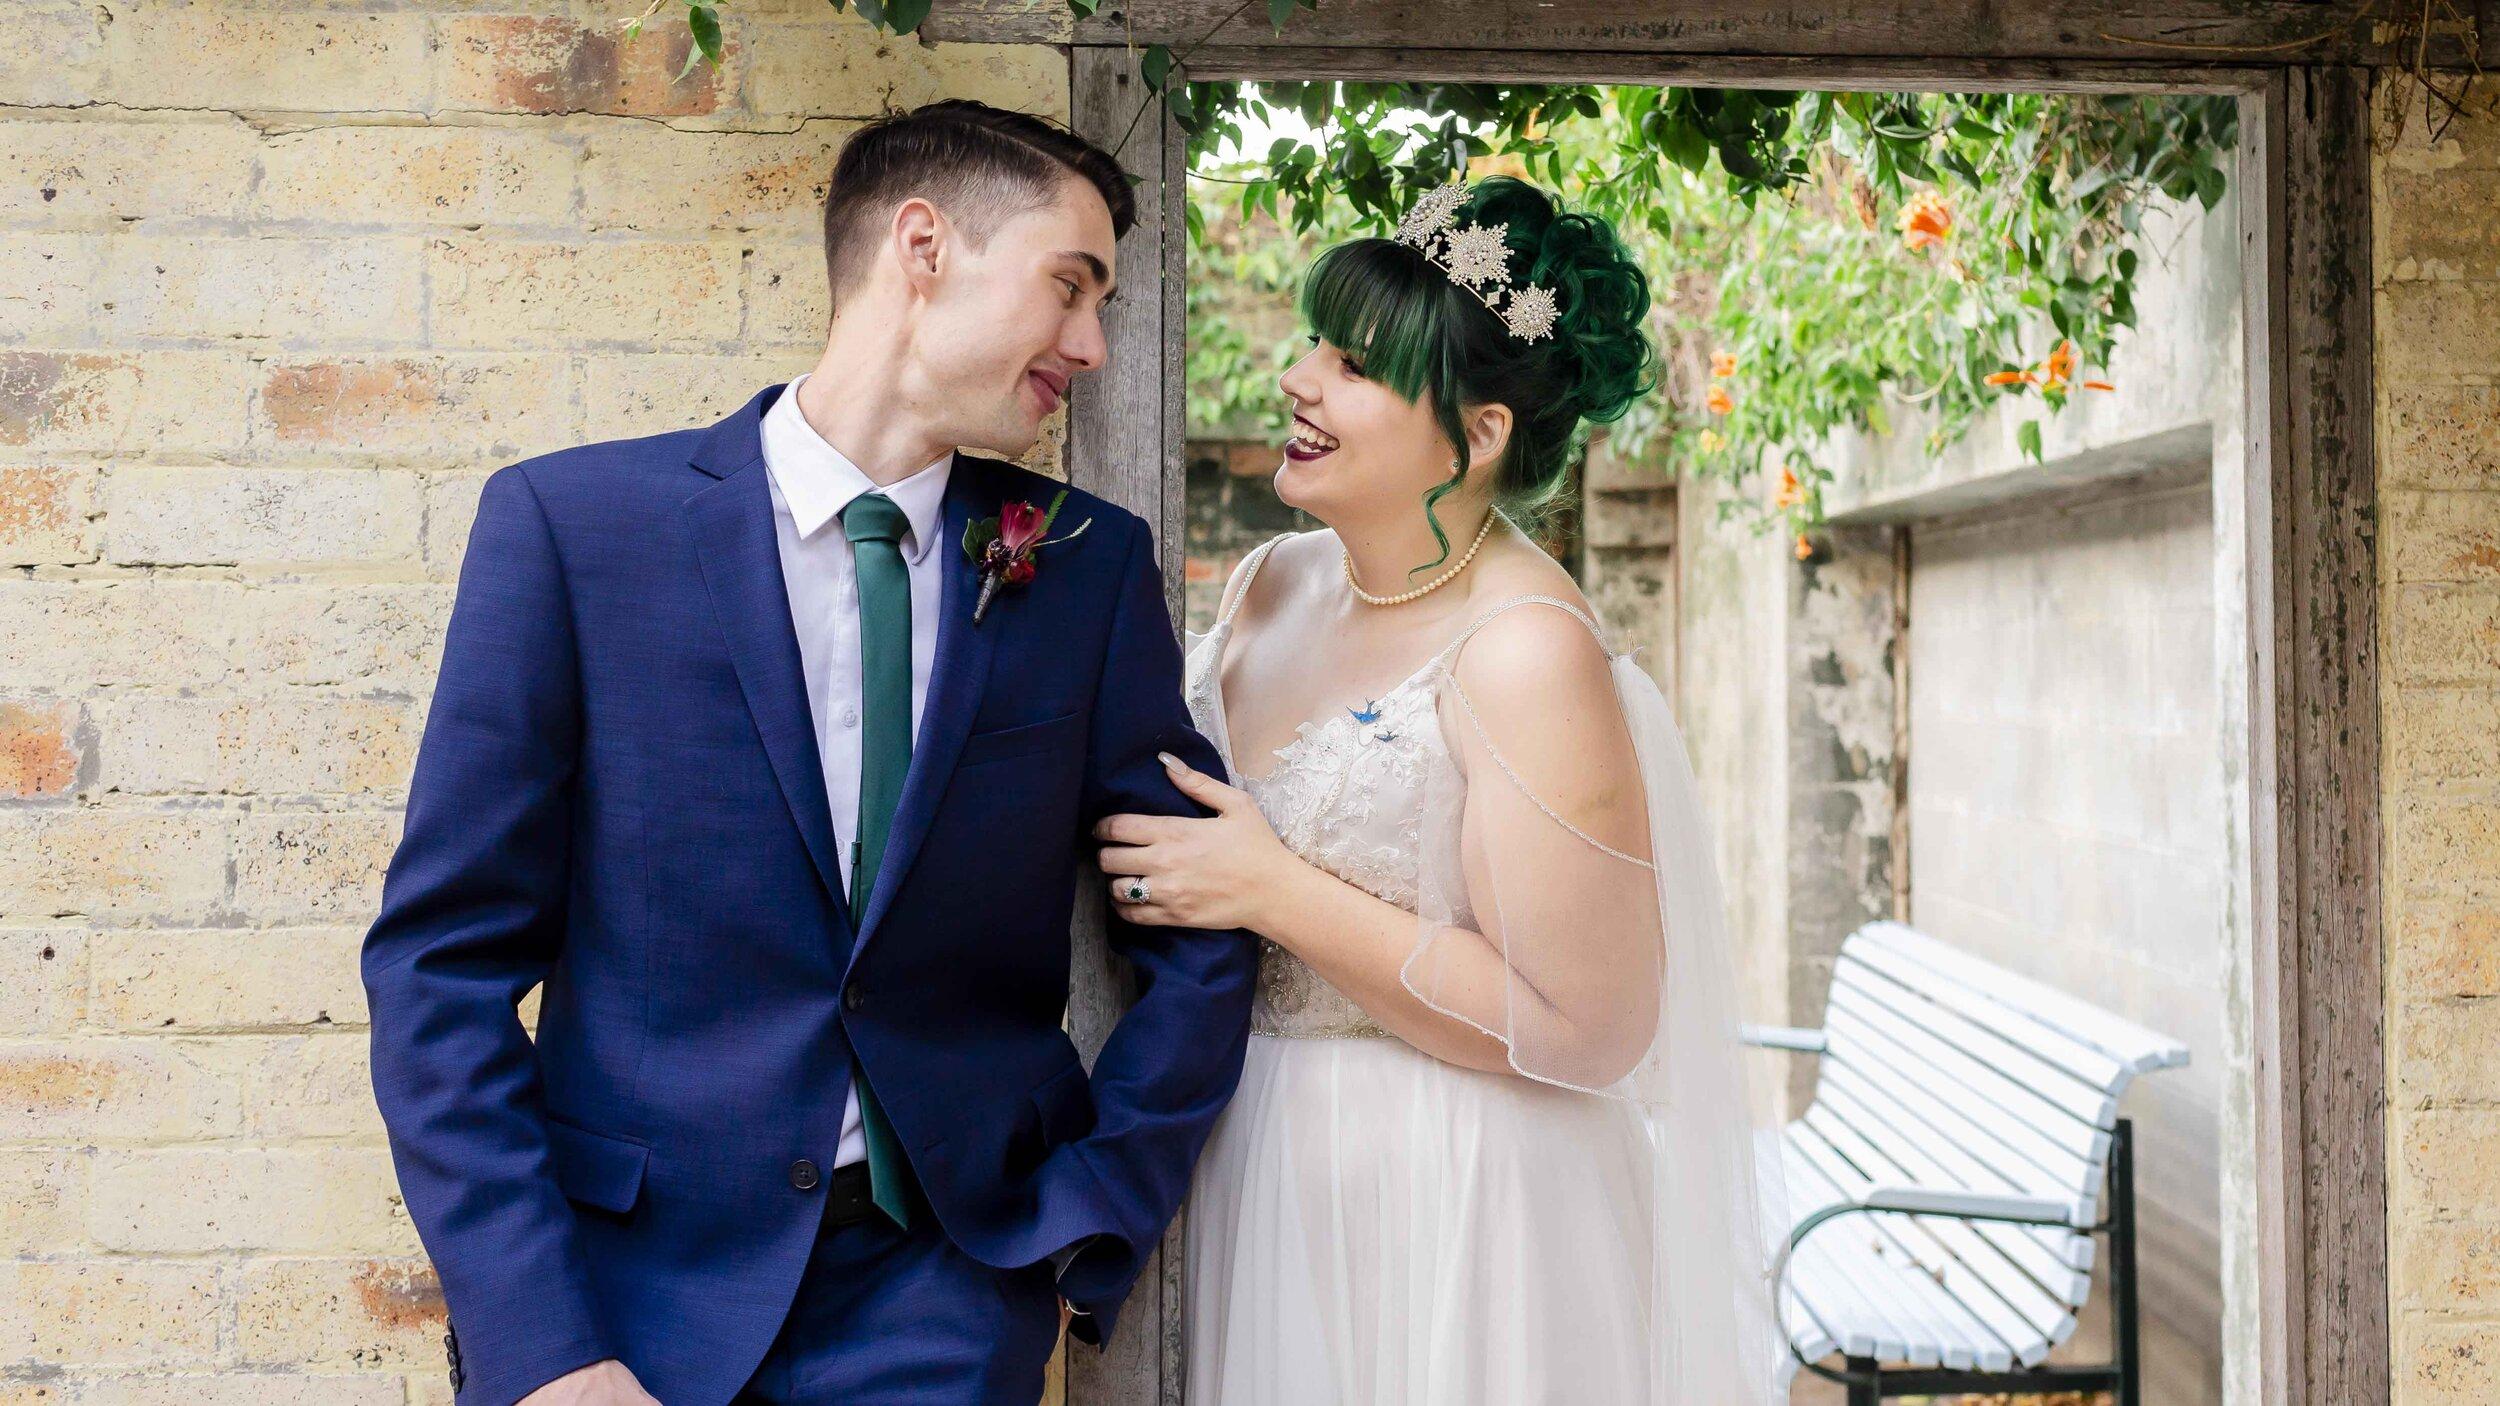 Jack + Emily - Lightspace Wedding 07.09.2019